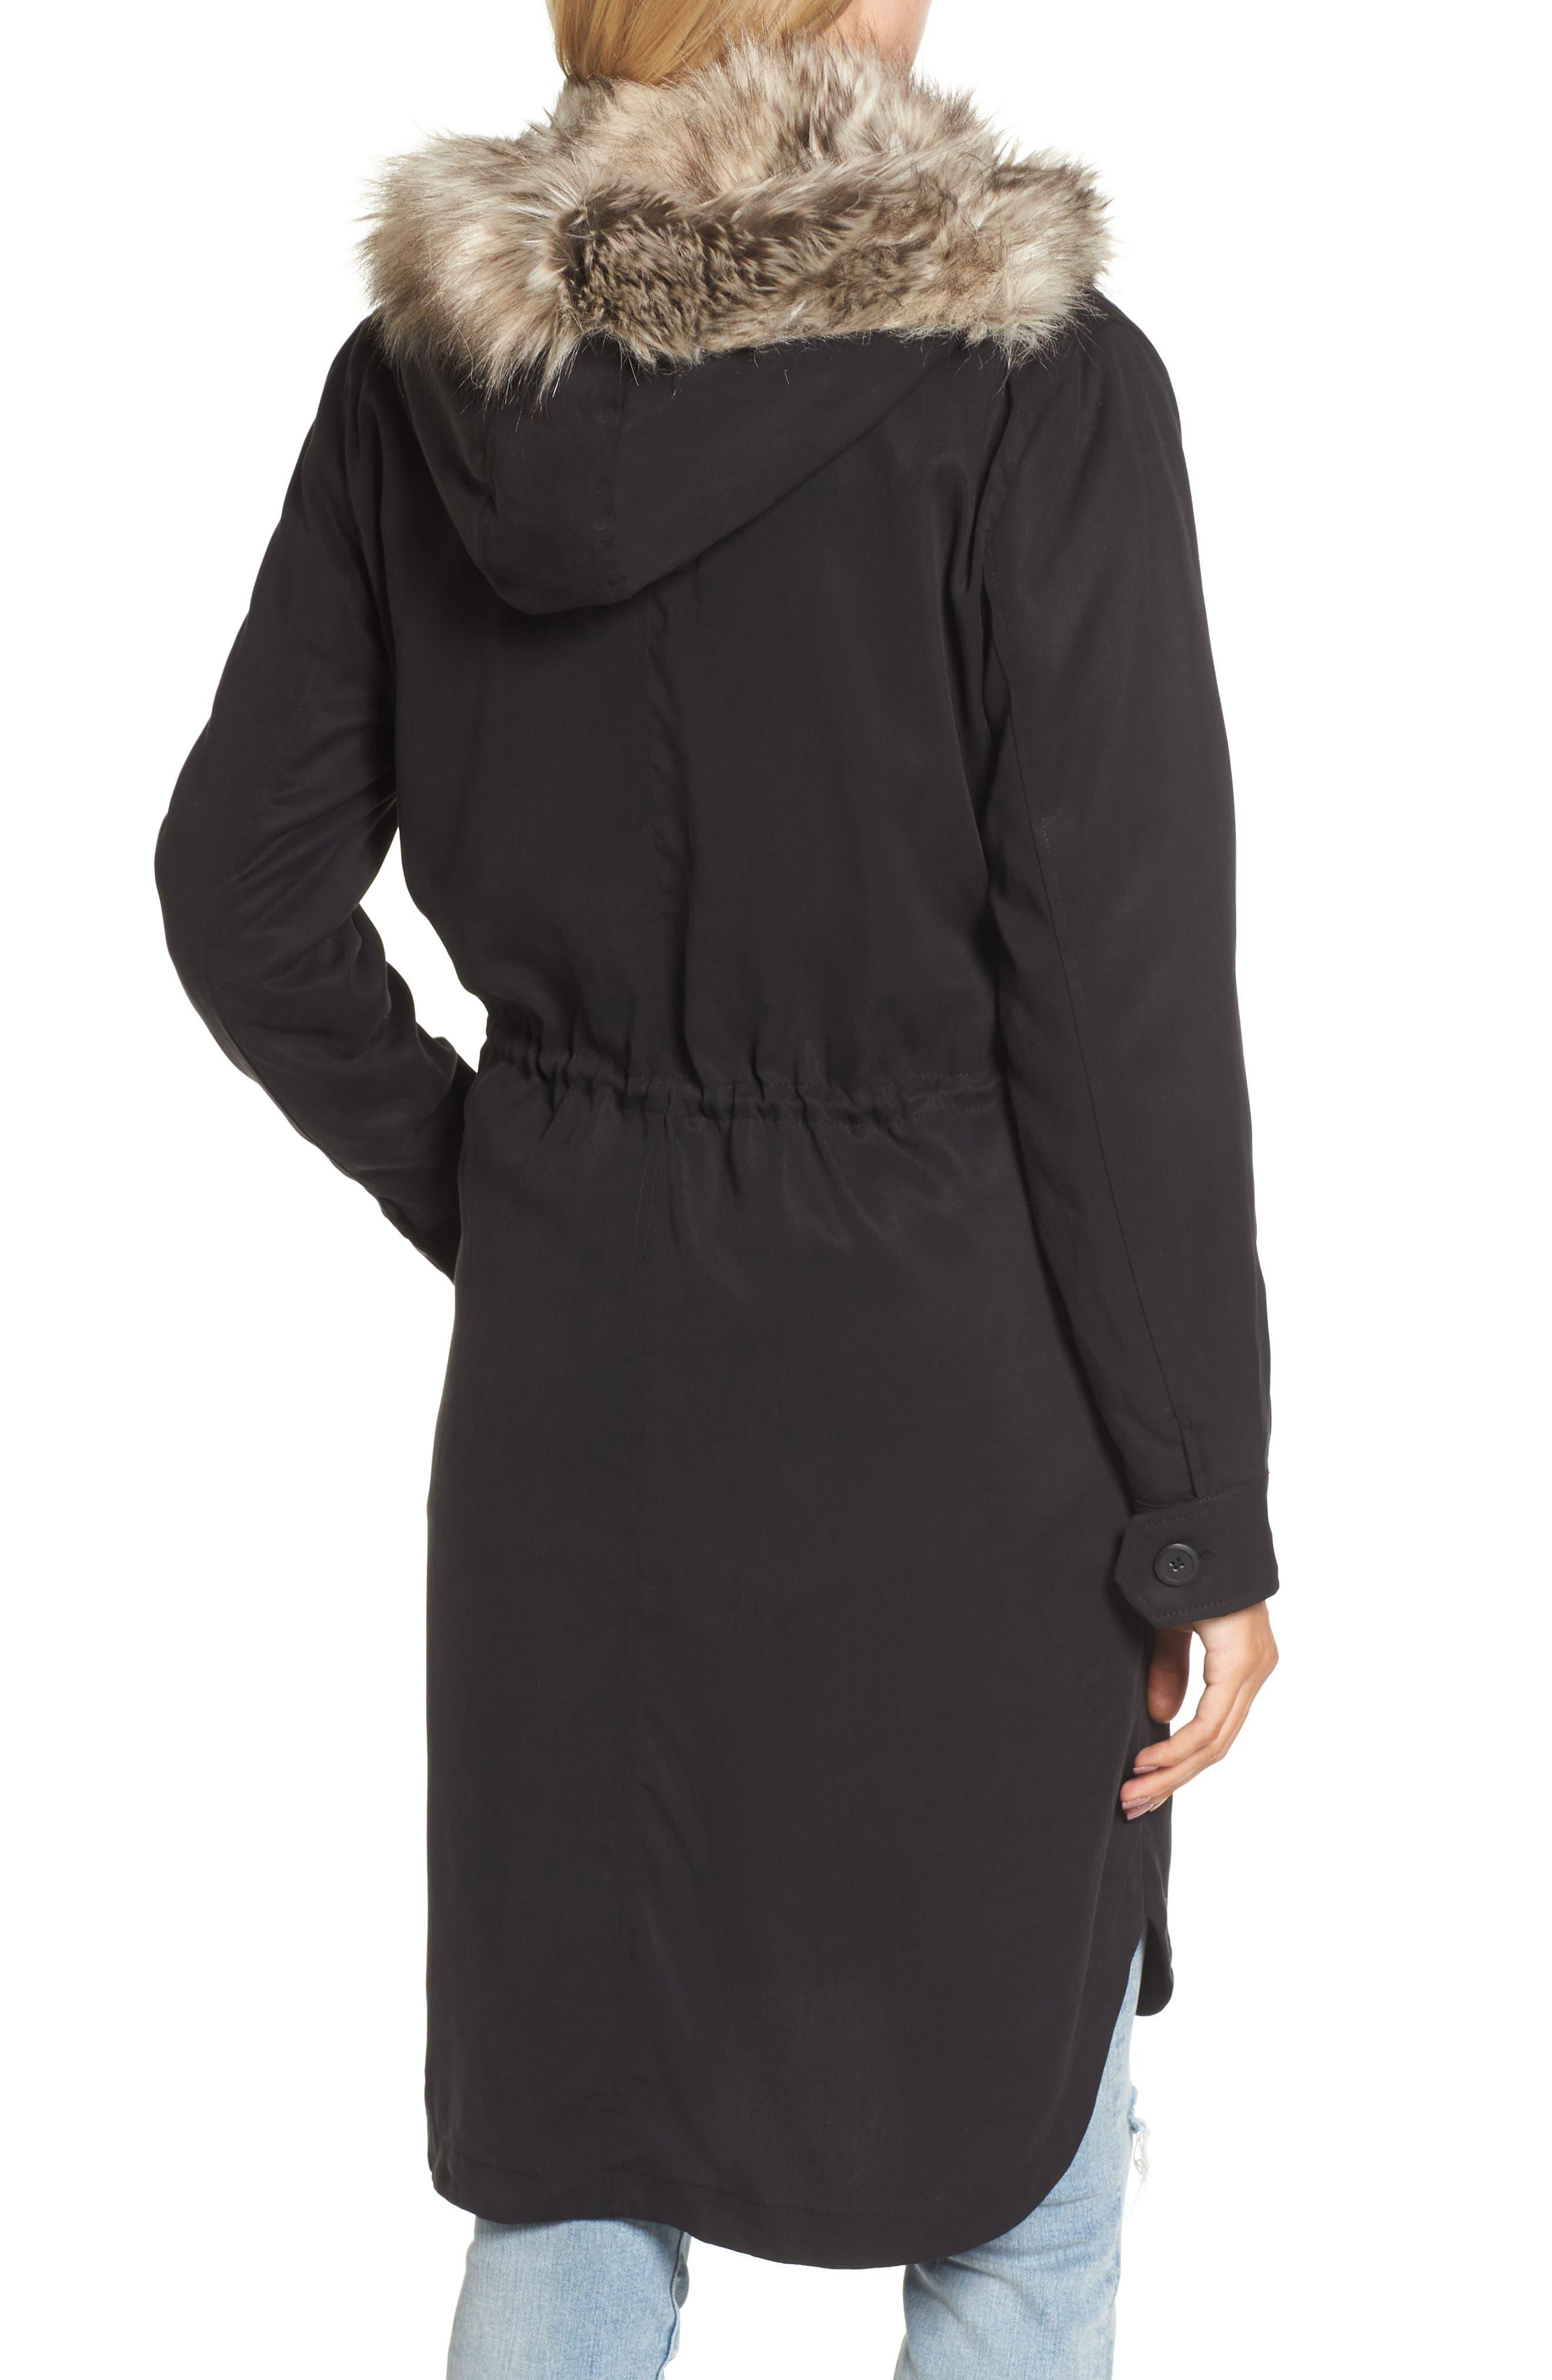 Walsh Tencel<sup>®</sup> Coat with Detachable Hooded Faux Fur Vest,                             Alternate thumbnail 2, color,                             001